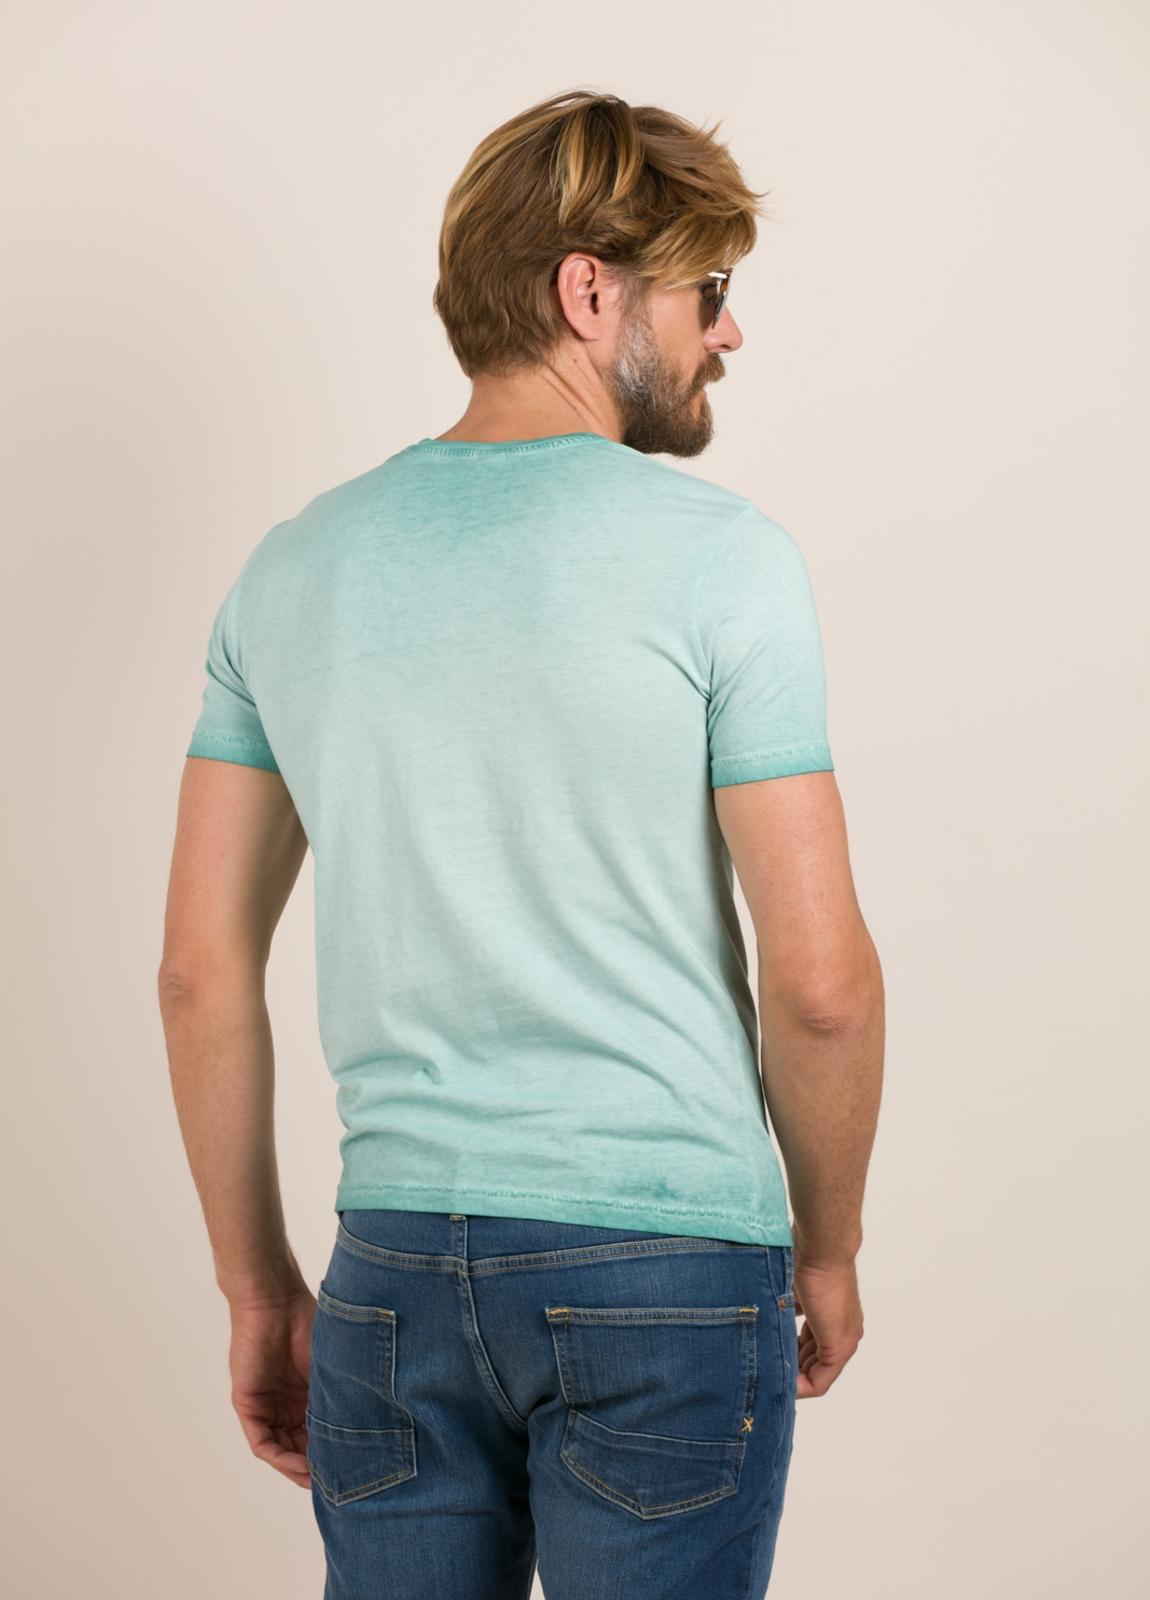 Camiseta BOB estampado vintage turquesa - Ítem2